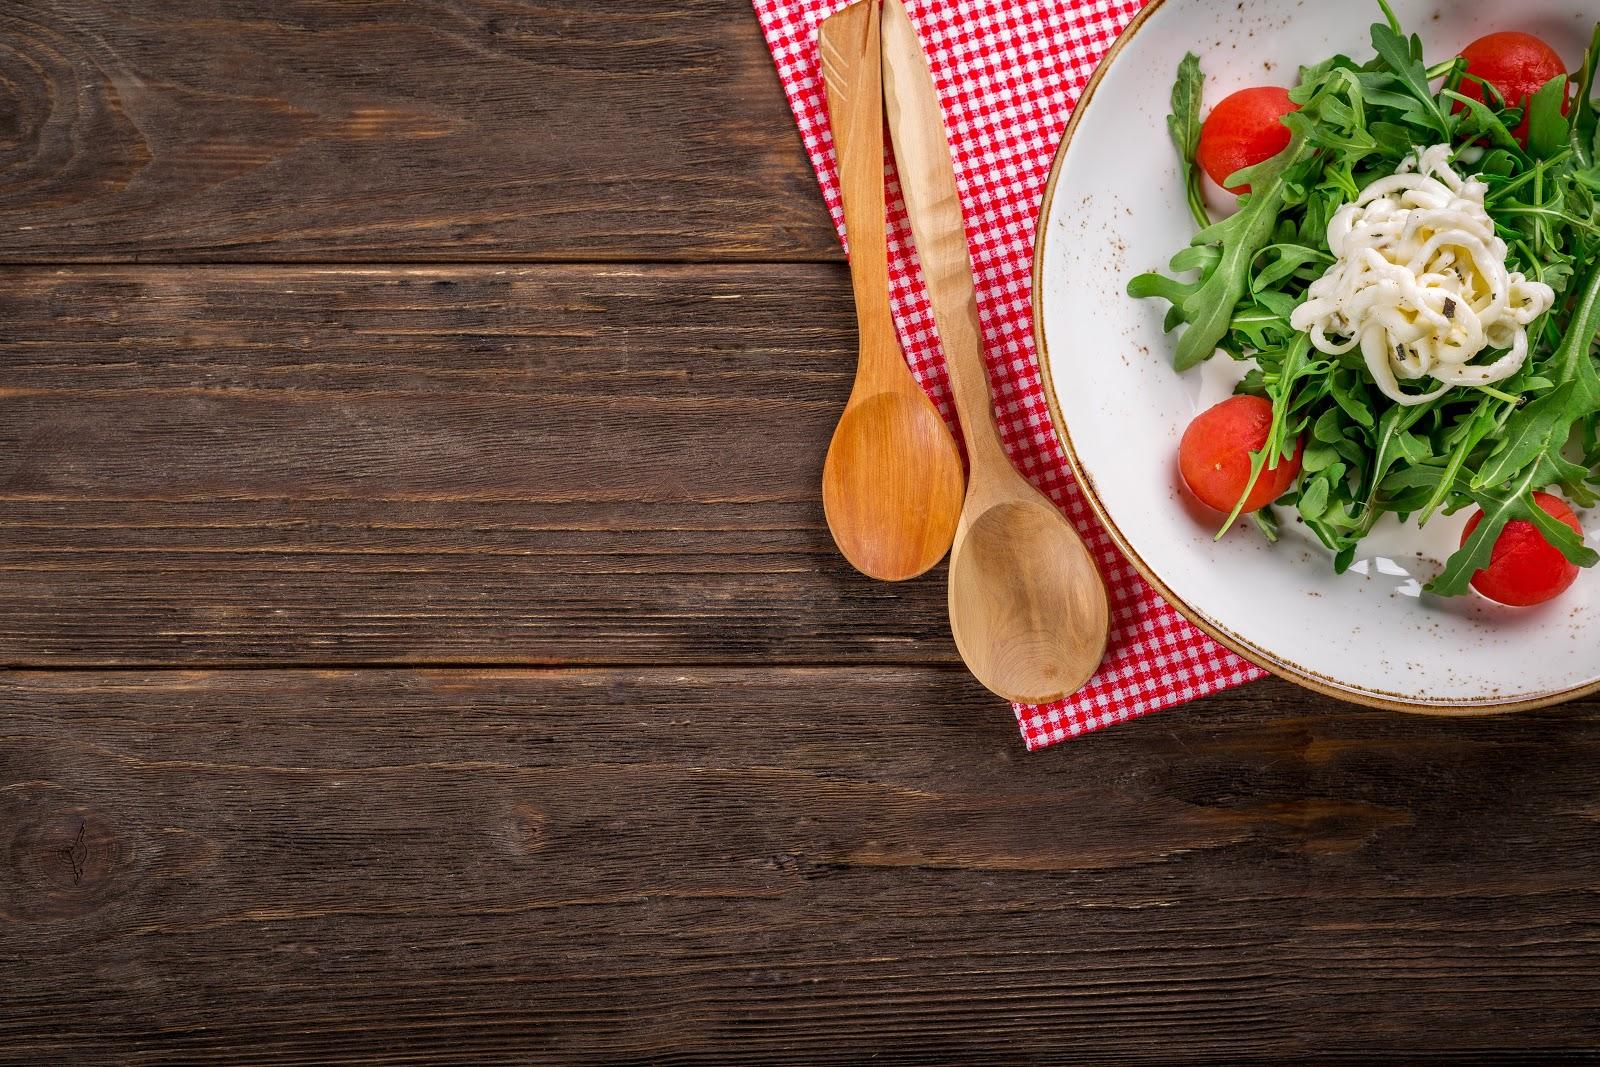 prato de alimentos saudaveis